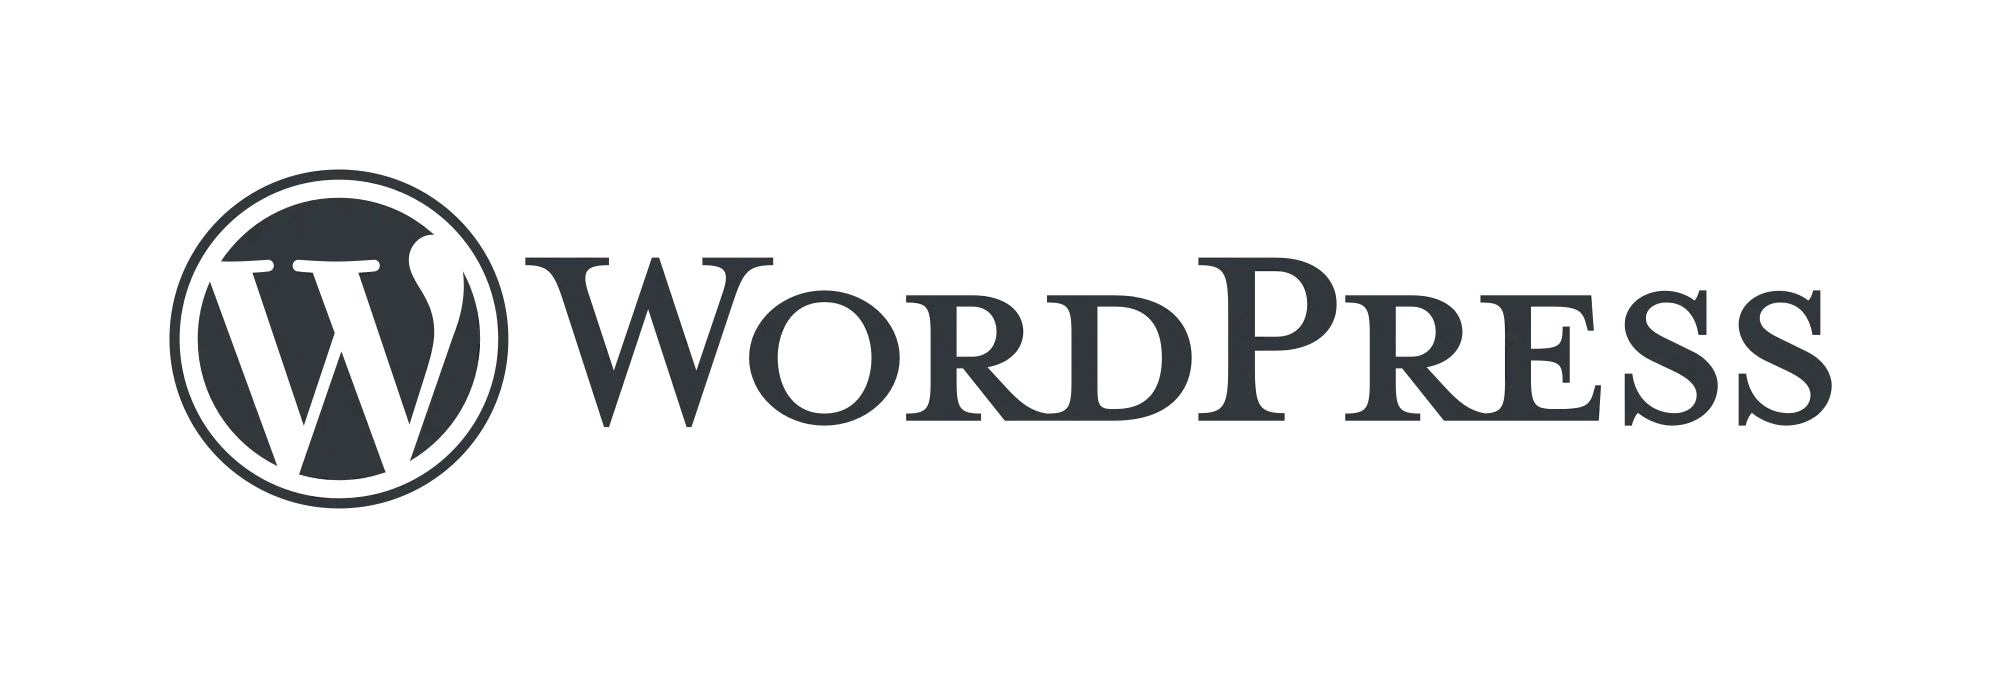 WordPress Thrust marketing online marketing